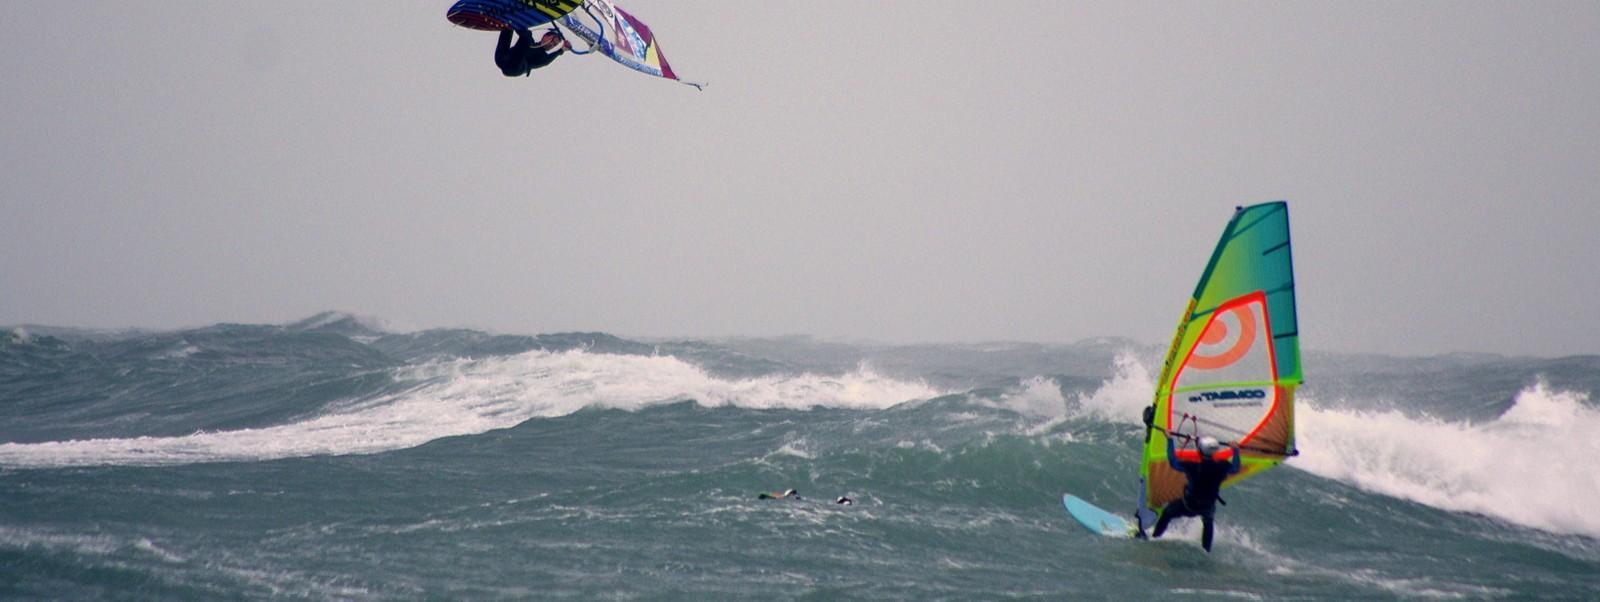 wind report FR, Cap d'Agde - Plage Port Nature (34)